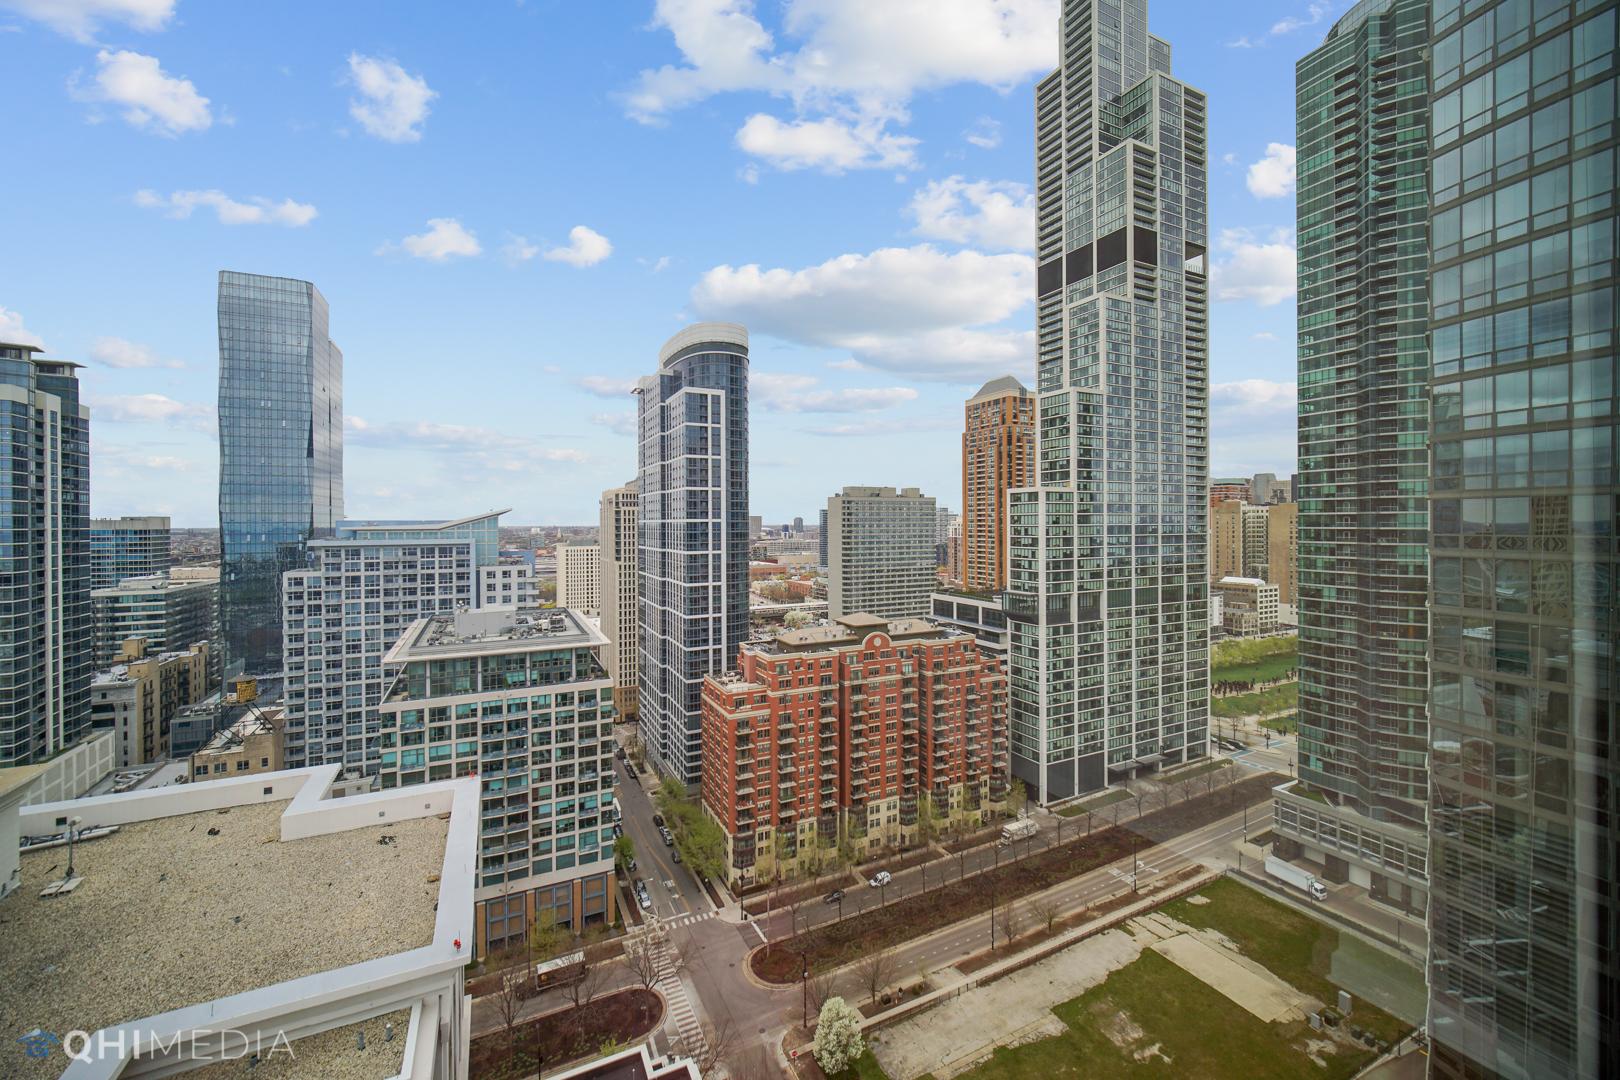 233 13th Unit Unit 2509 ,Chicago, Illinois 60605